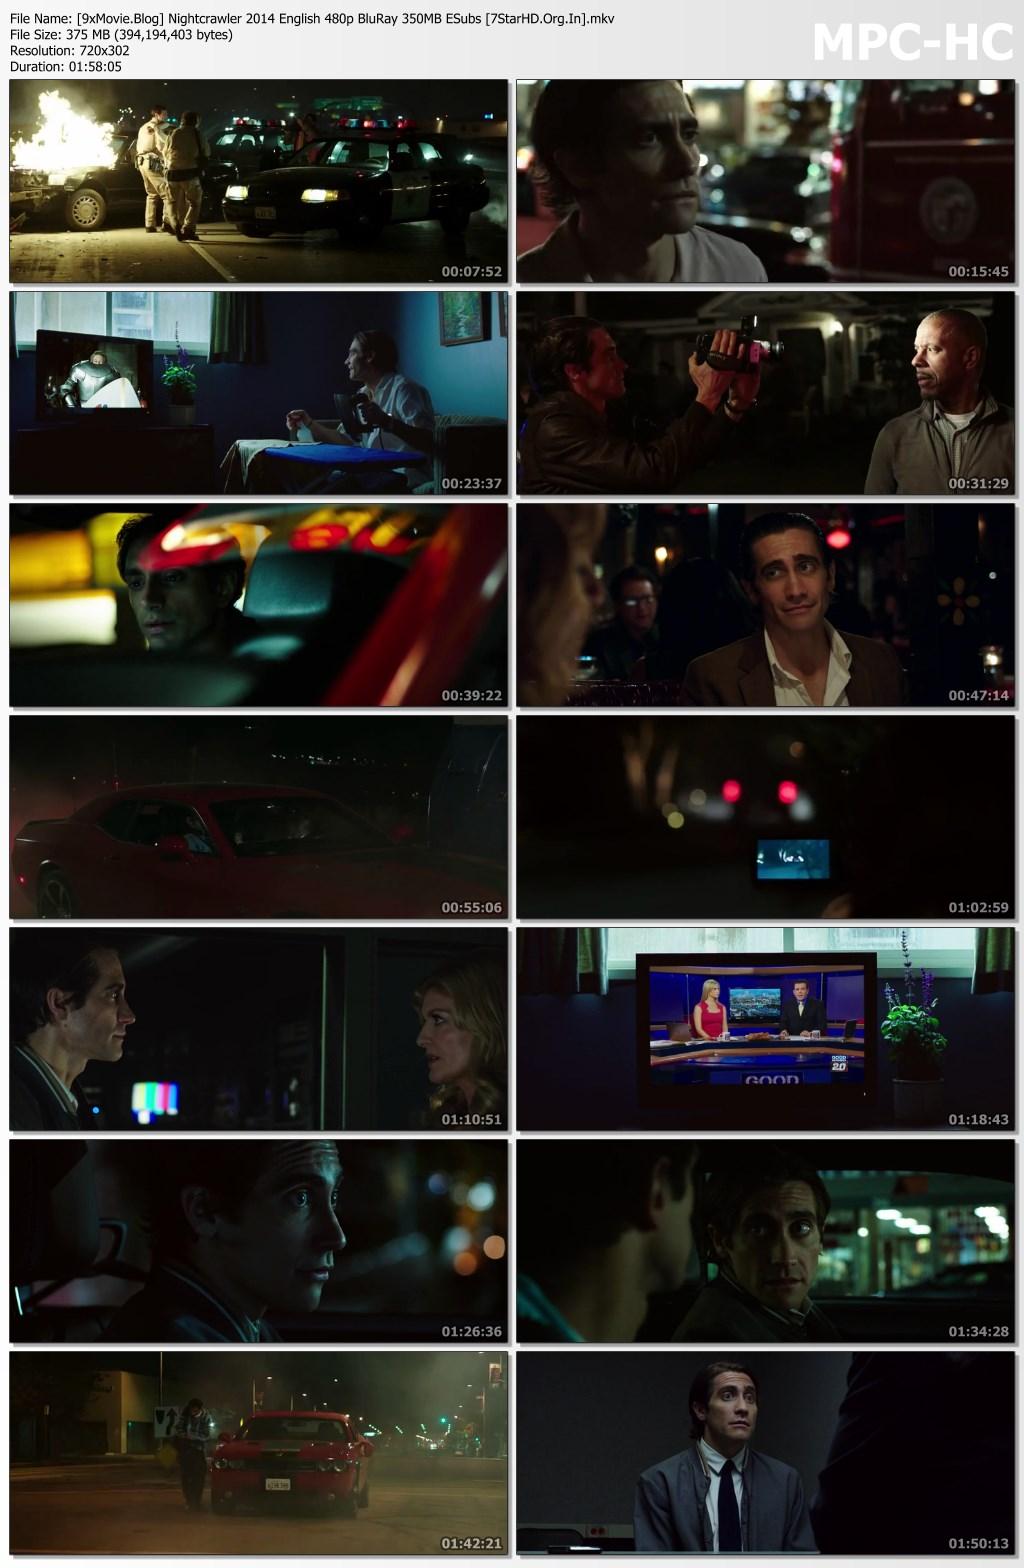 Nightcrawler 2014 English 480p BluRay x264 350MB ESubs